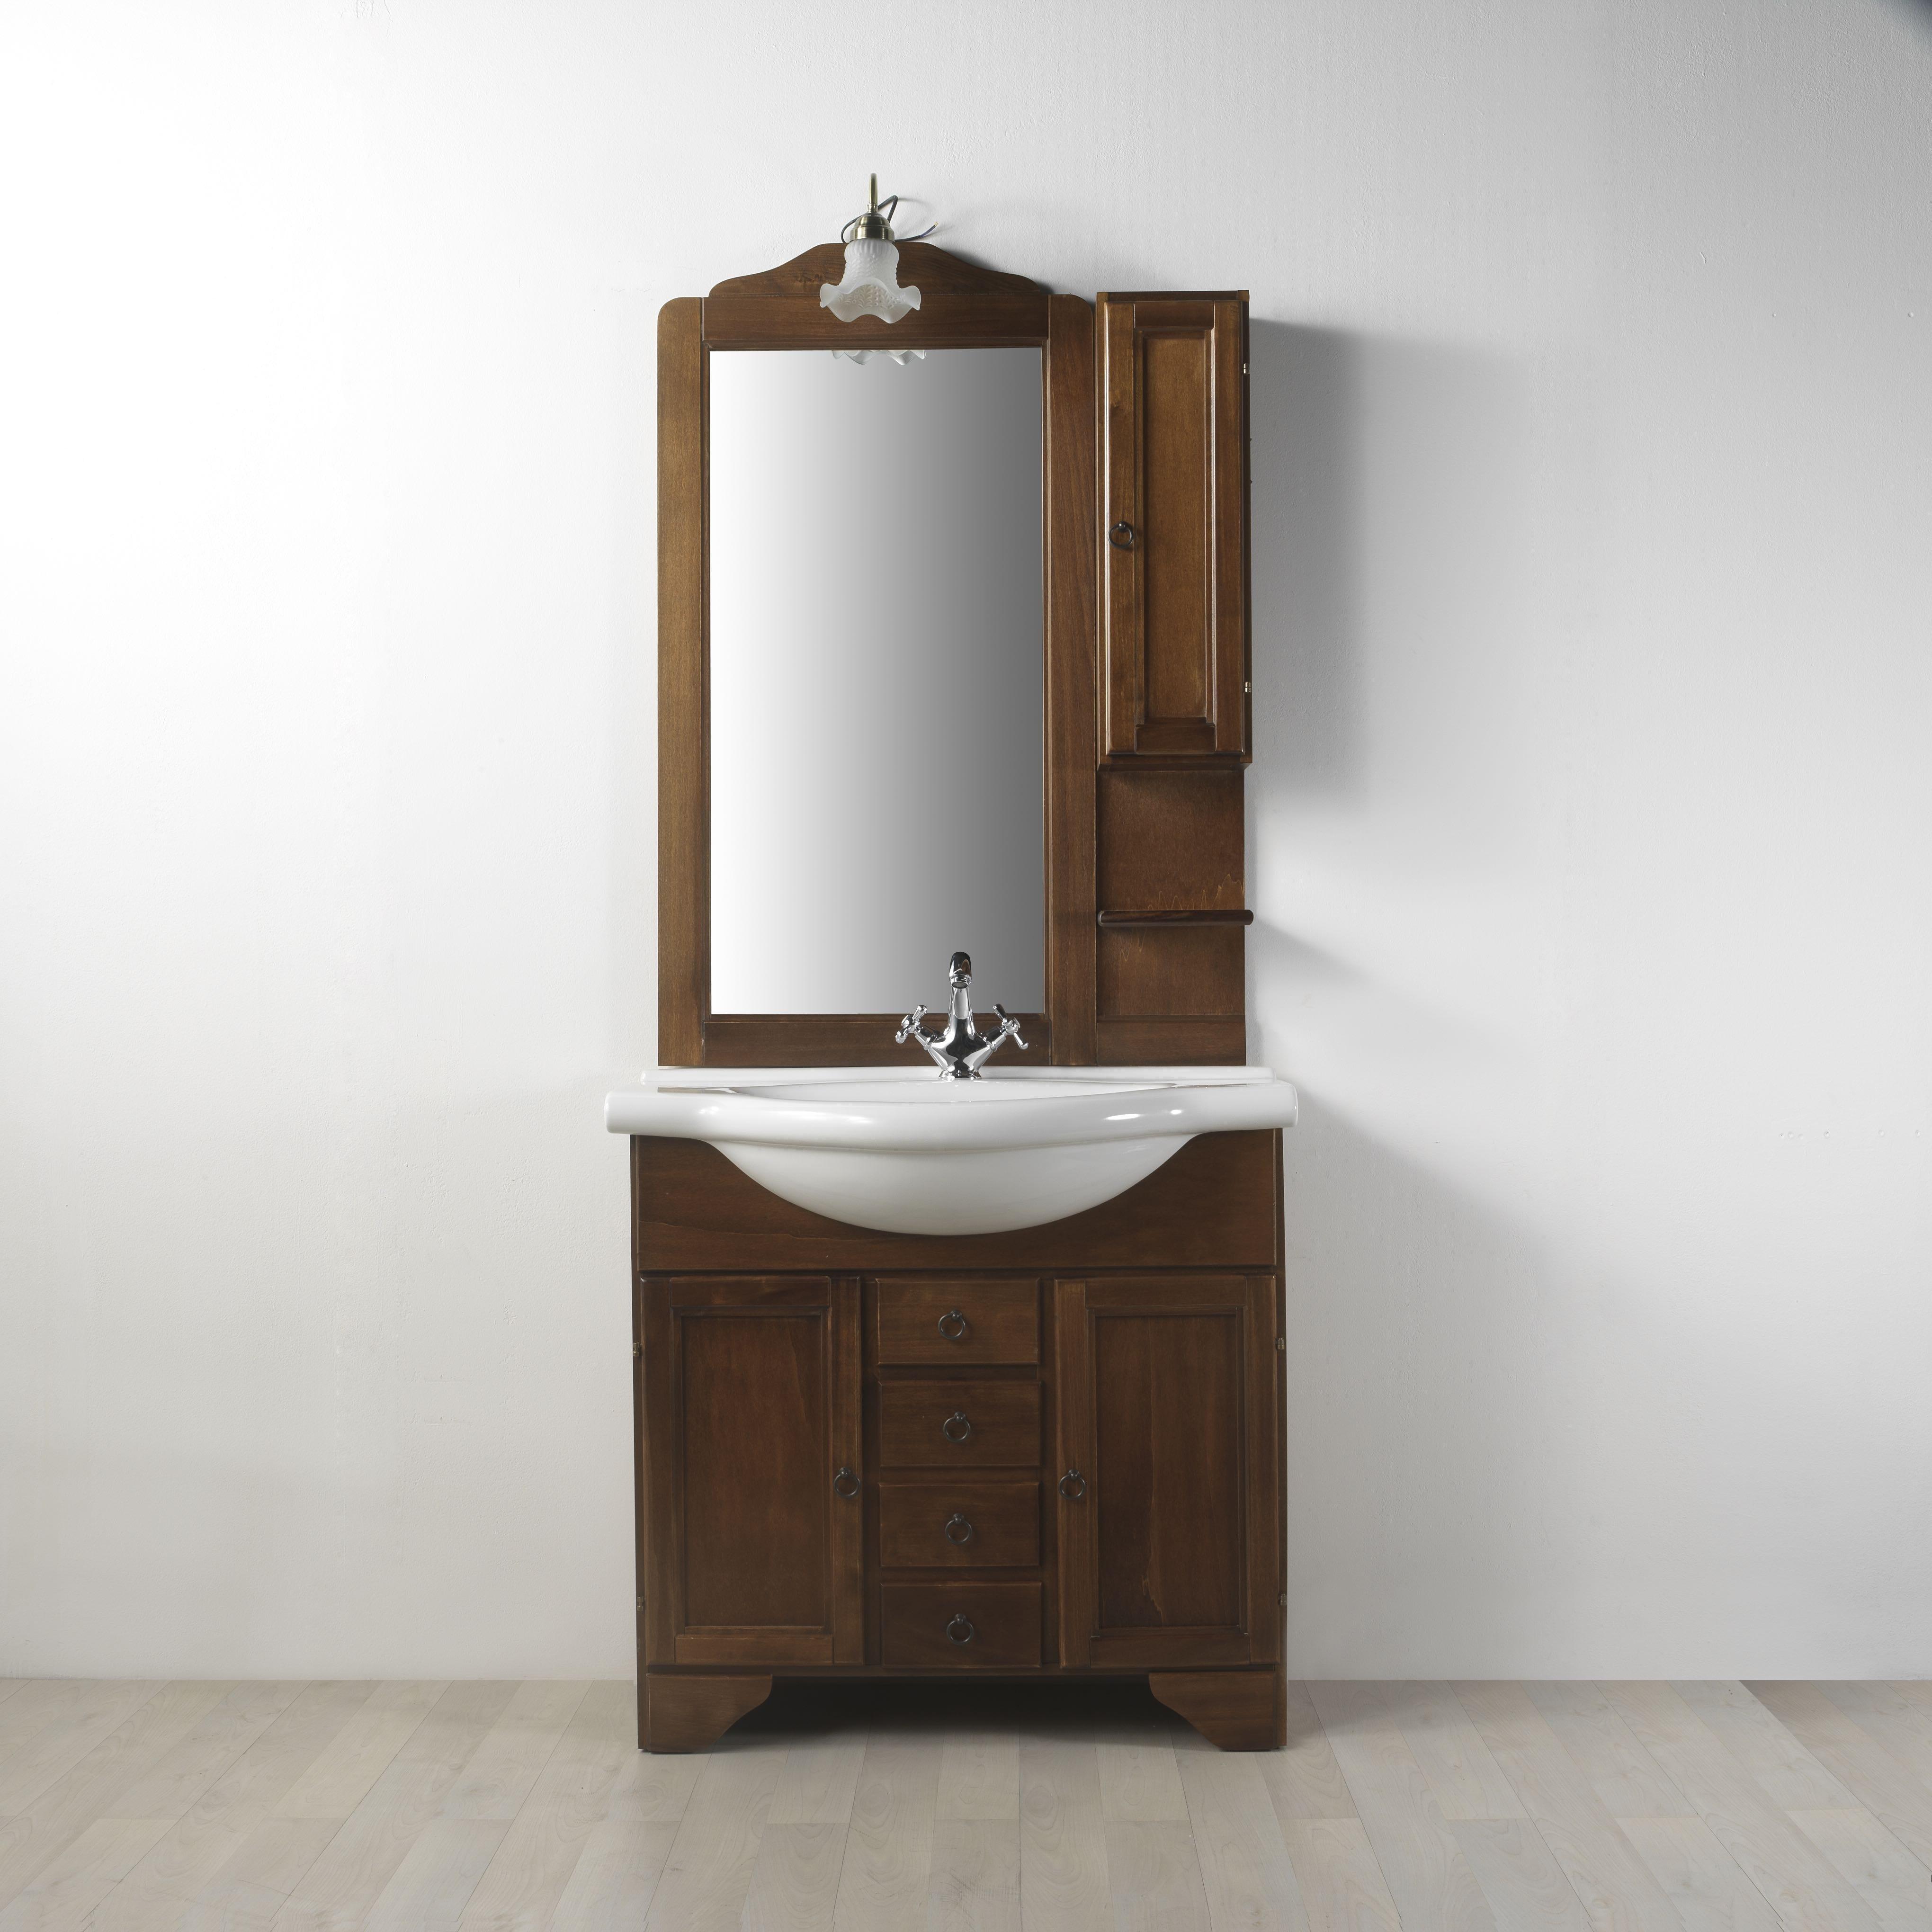 Mobile arredo bagno in arte povera lavanda da 85 cm eur - Arredo bagno arte povera ...